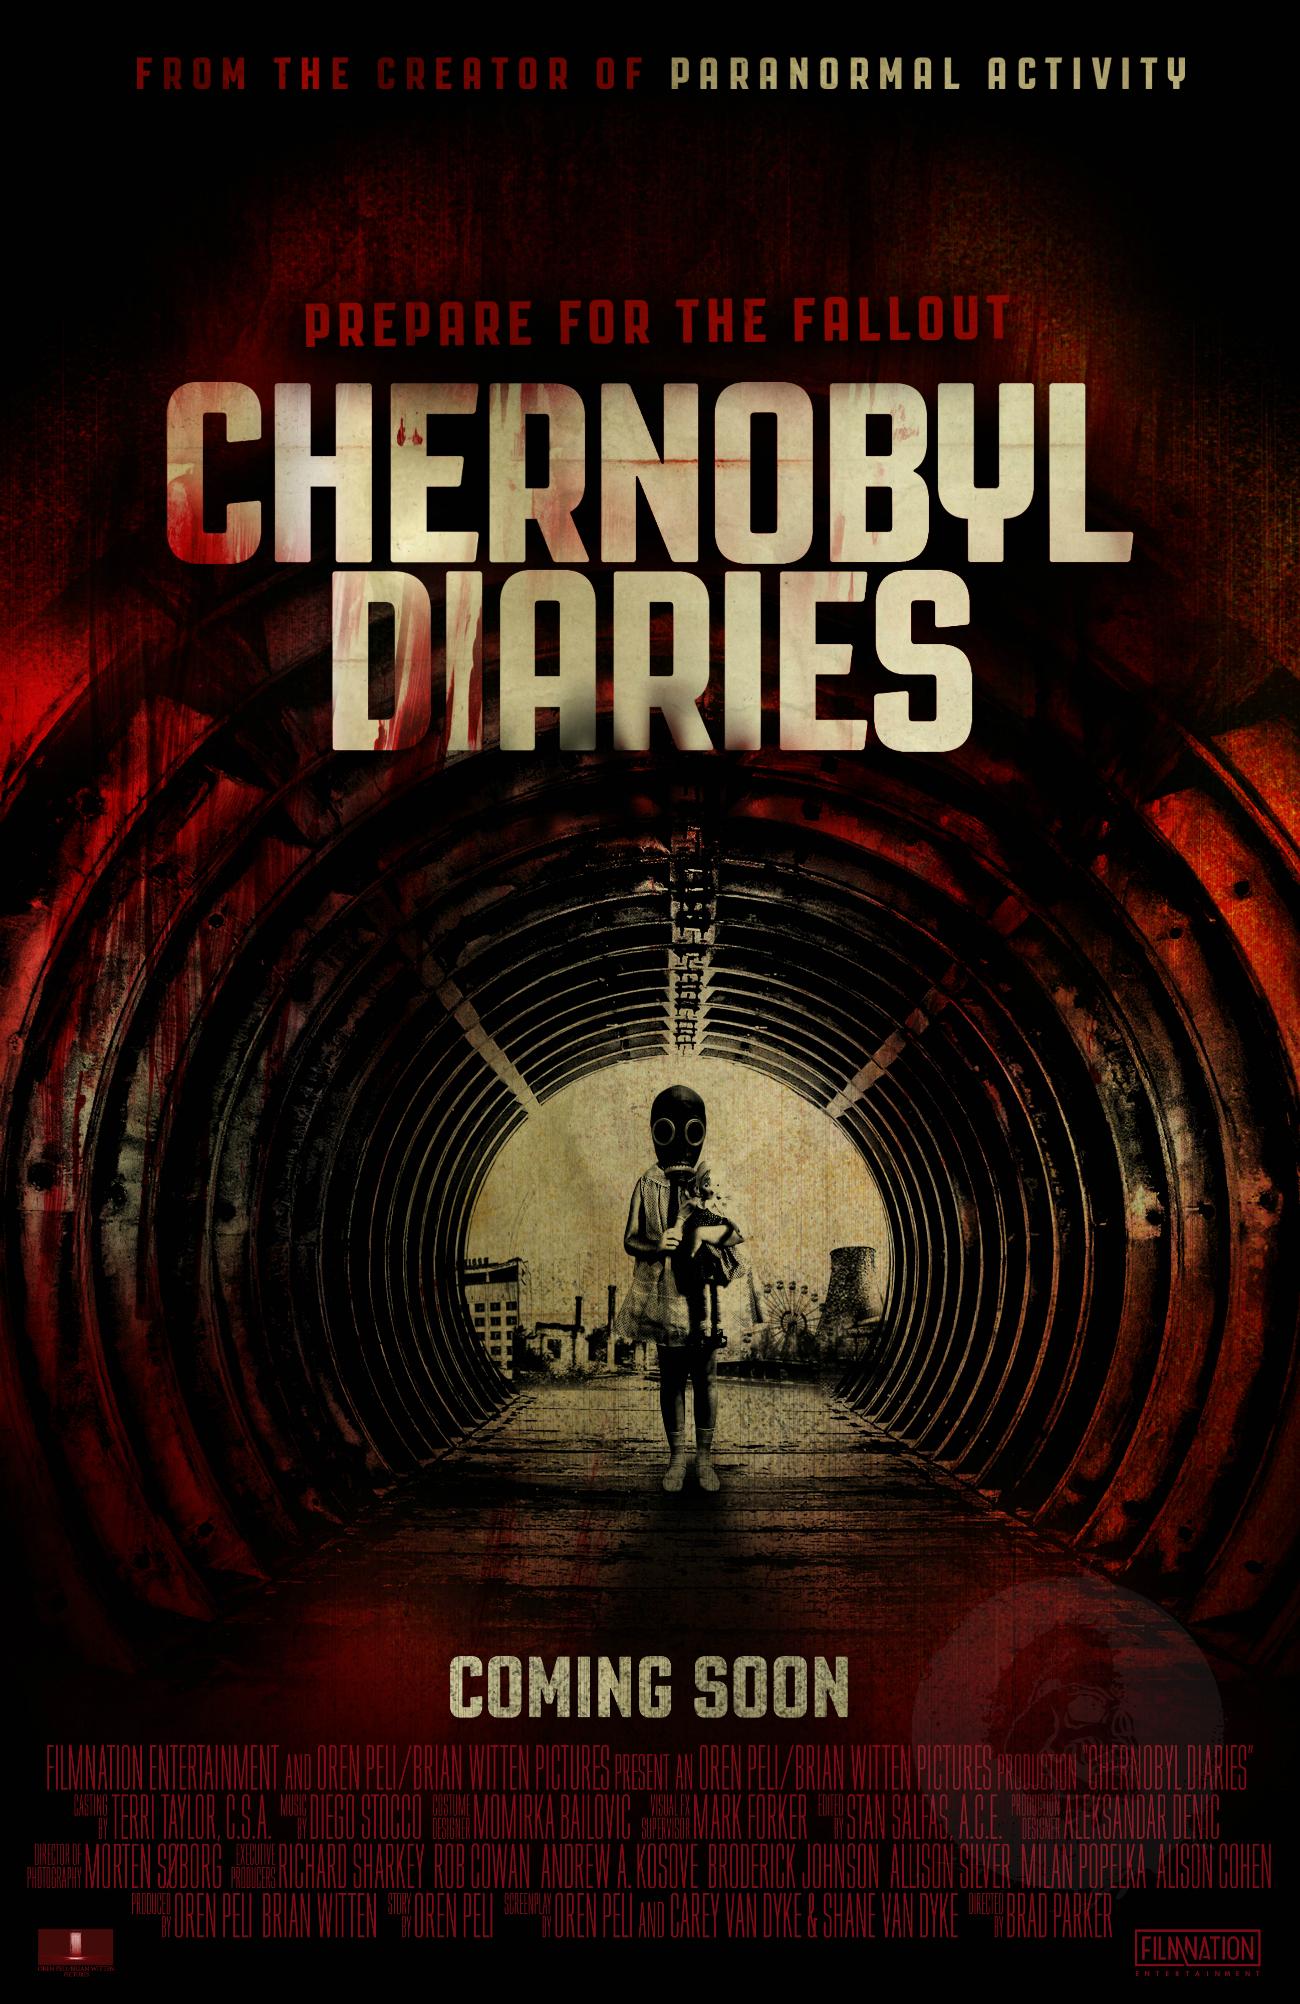 International Chernobyl Diaries Poster Premiere Prepares